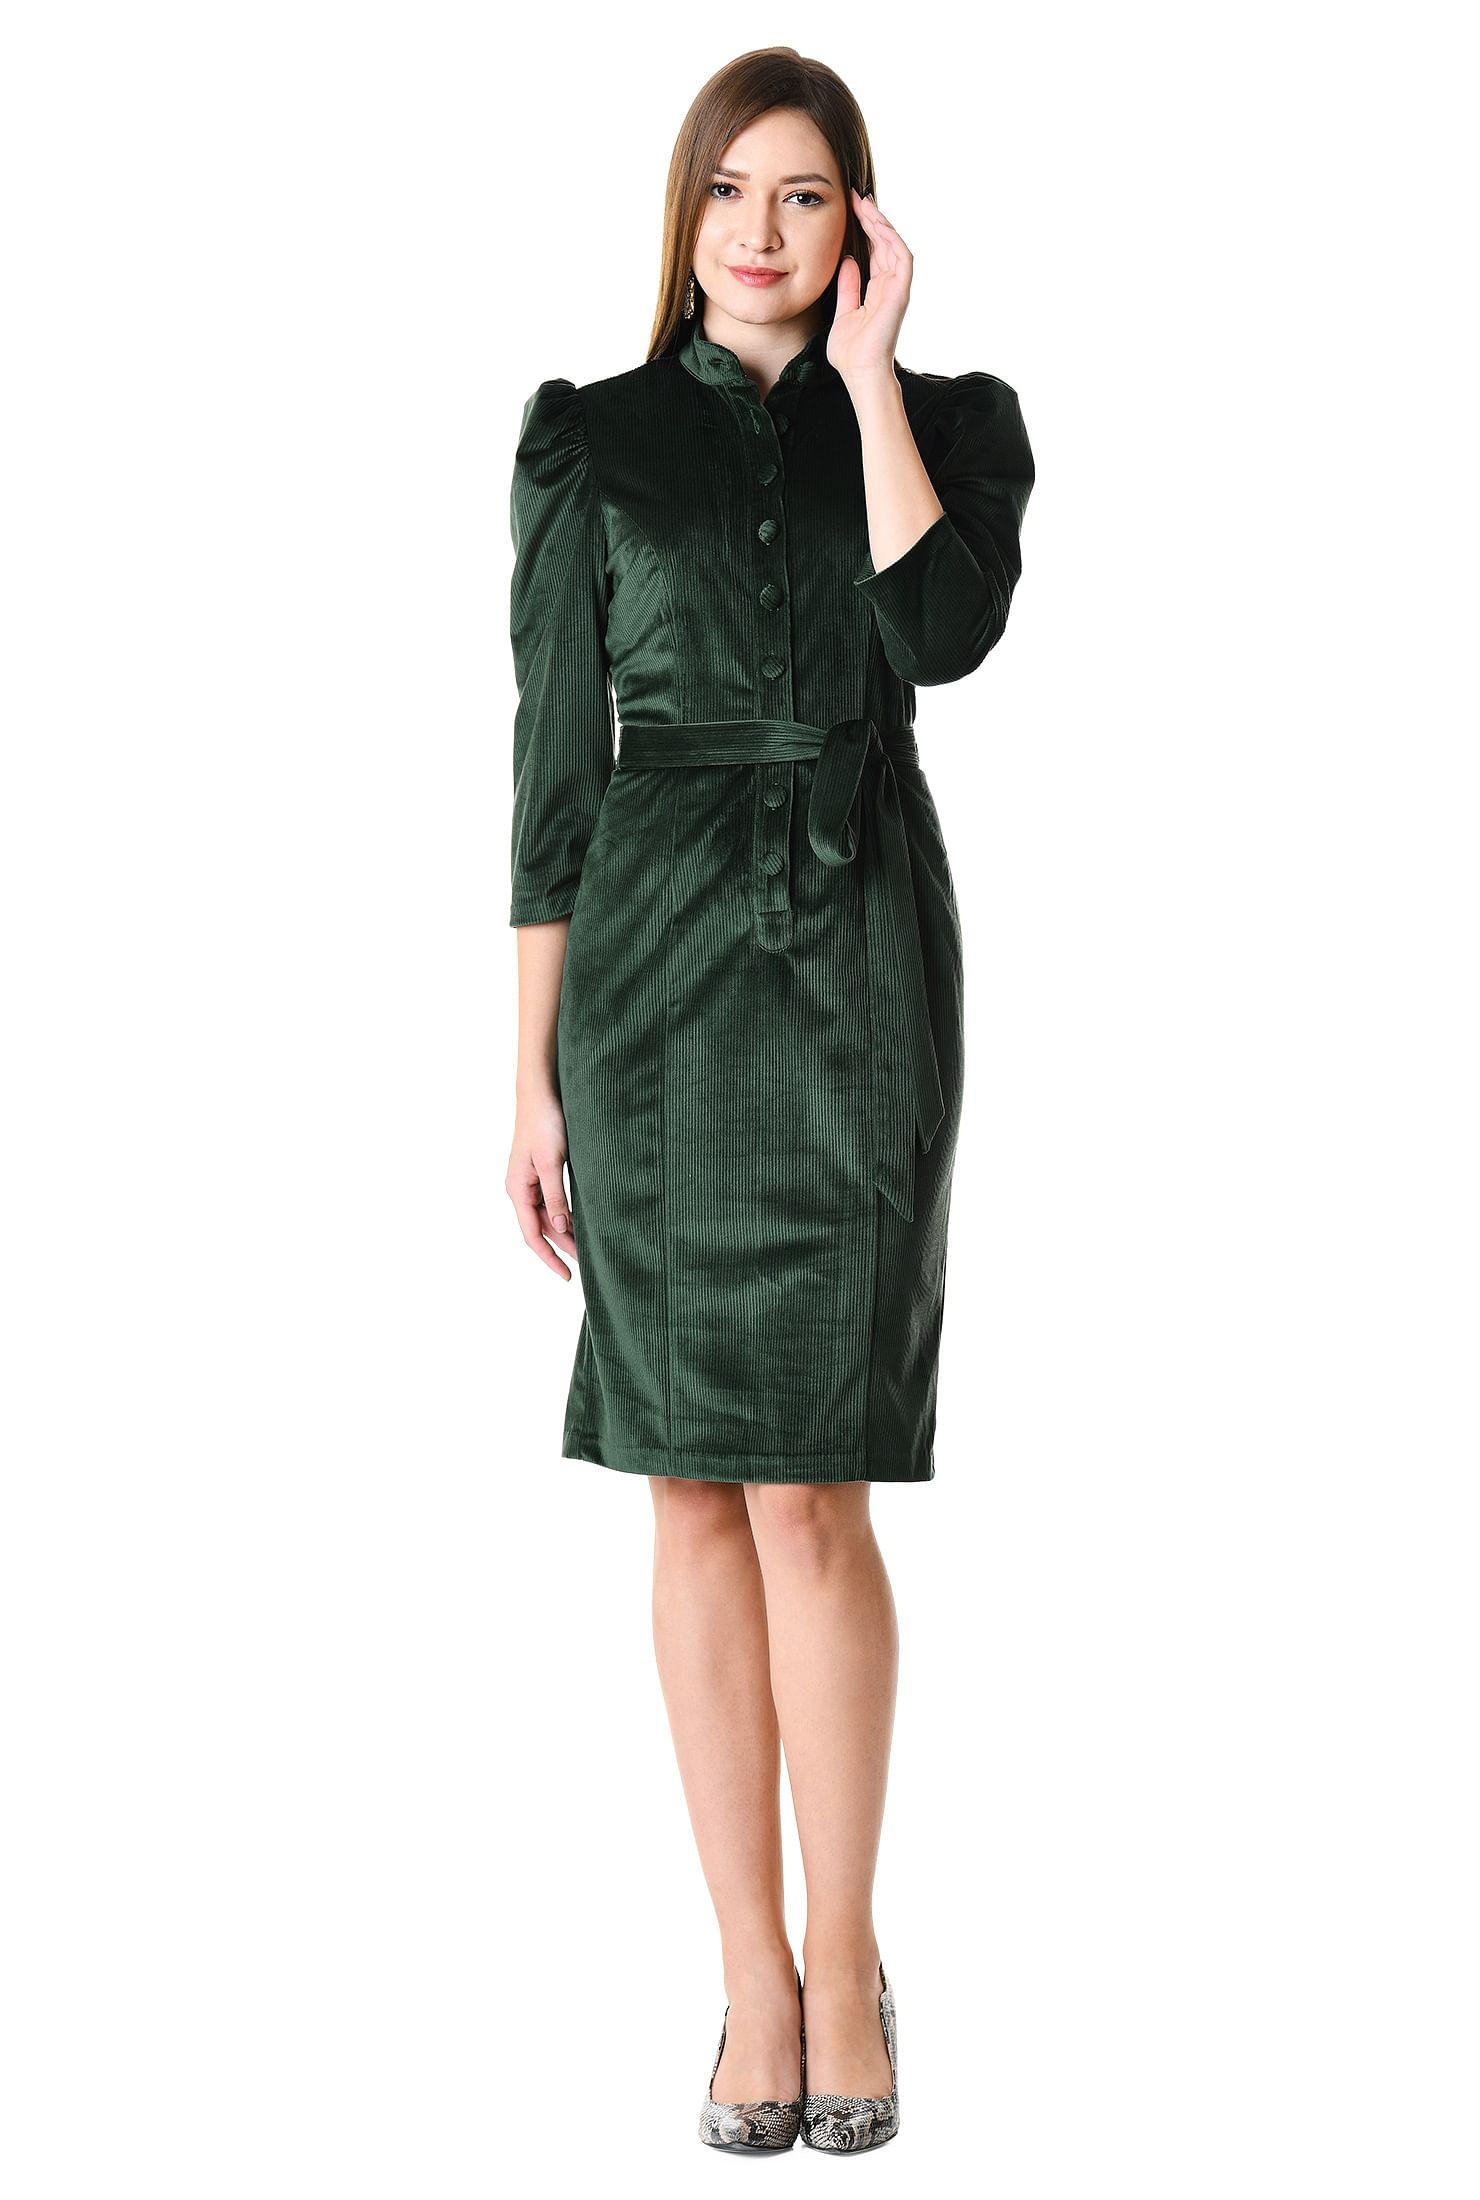 5c69ef2ad52e7 back vent dresses, bottle green dresses, corduroy dresses, knee length  dresses,